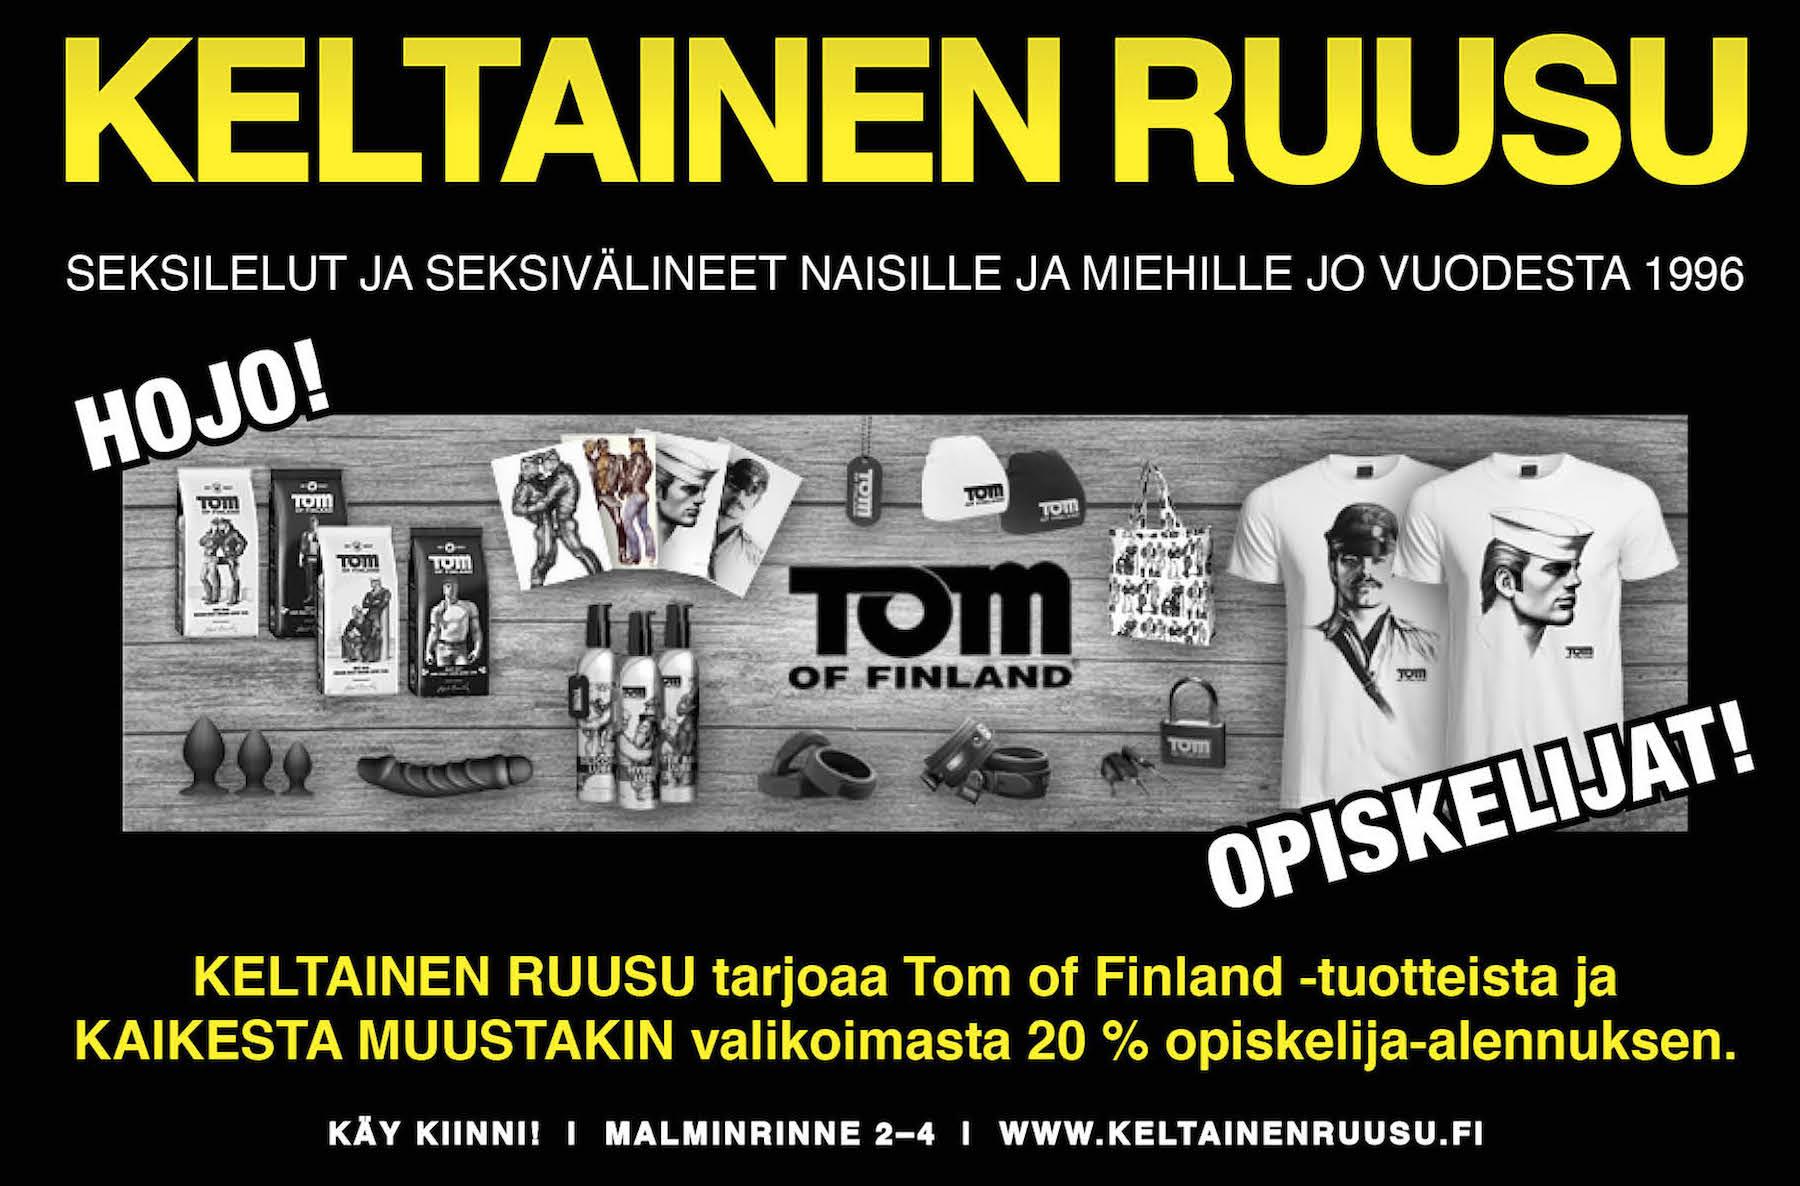 tom_of_finland_keltainen_ruusu